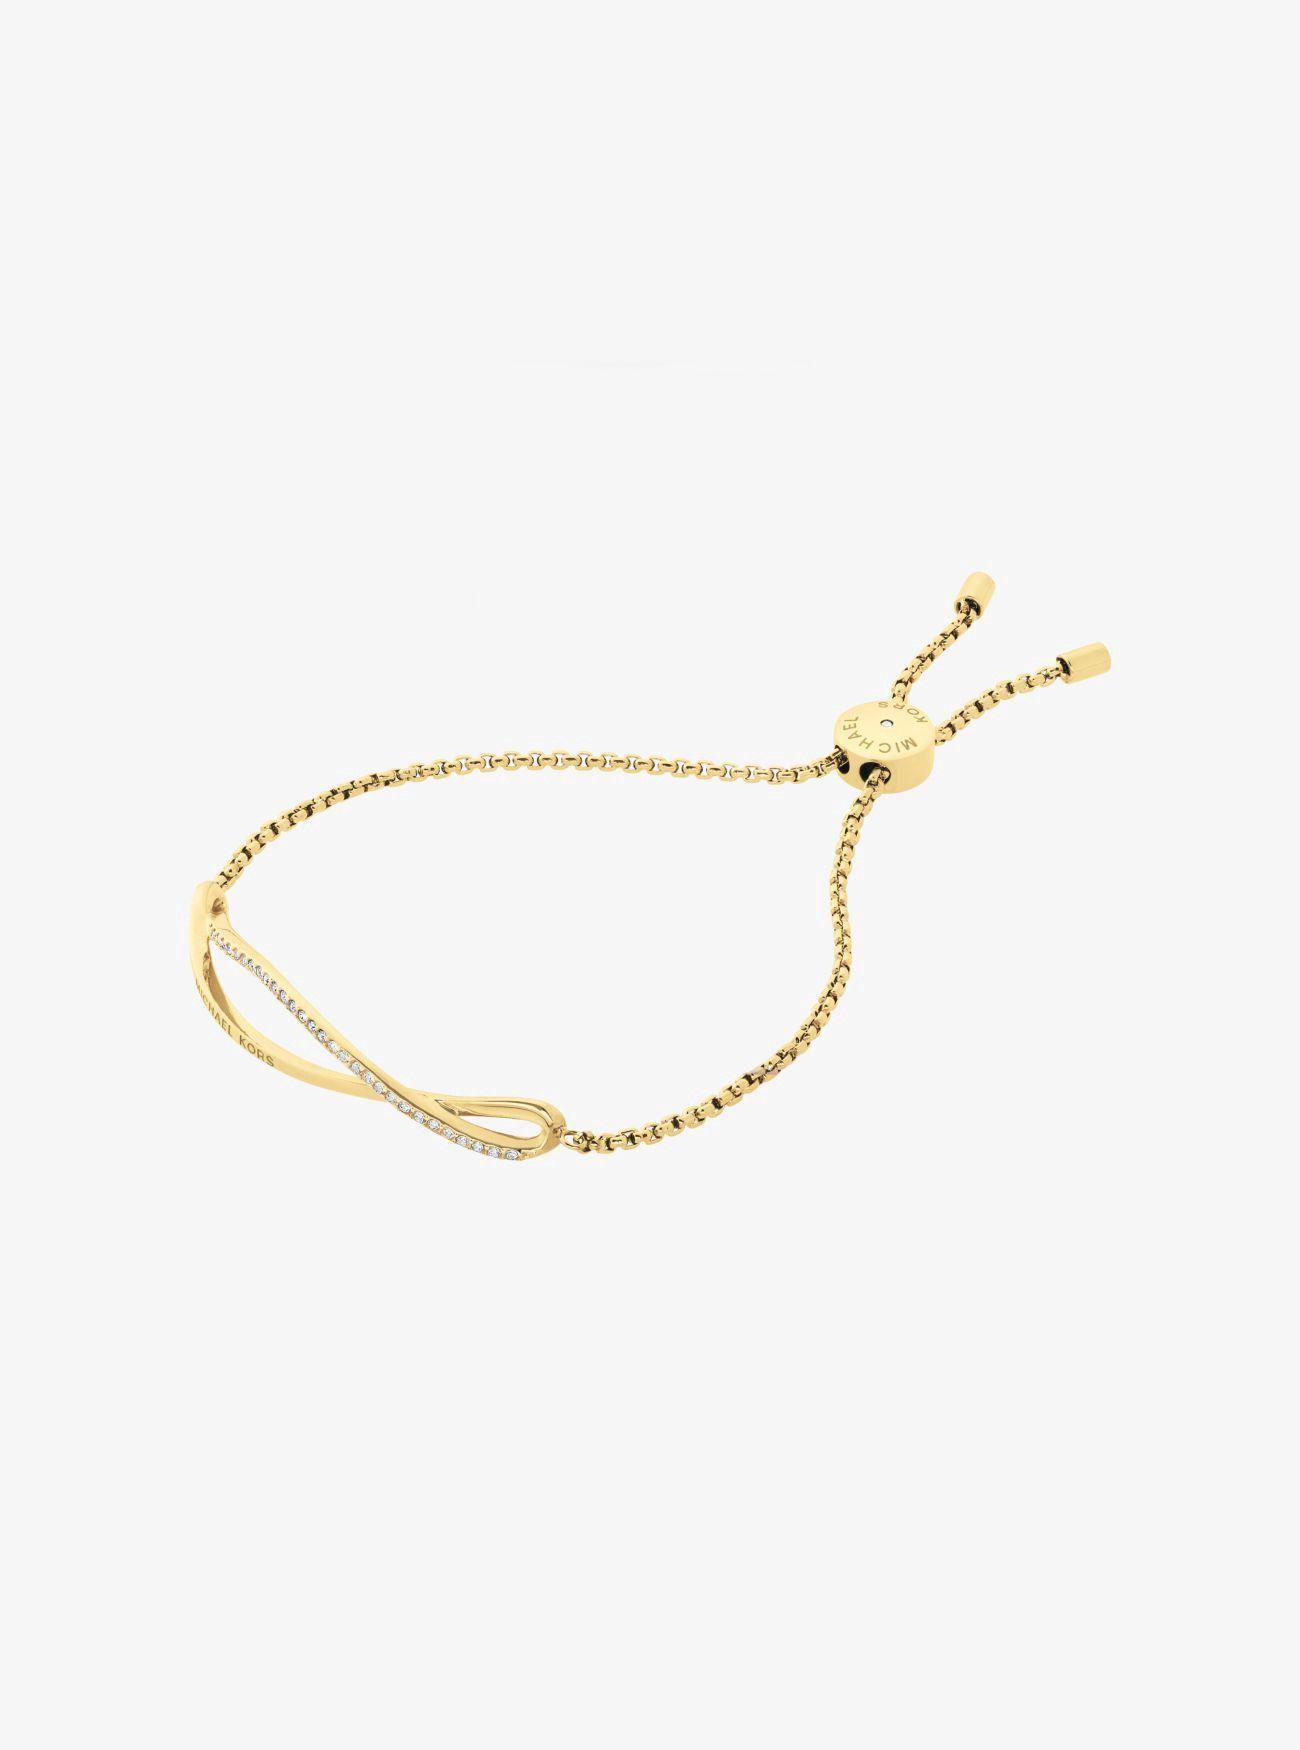 dac6c4205795 Michael Kors Pavé Gold-Tone Wave Slider Bracelet - Gold